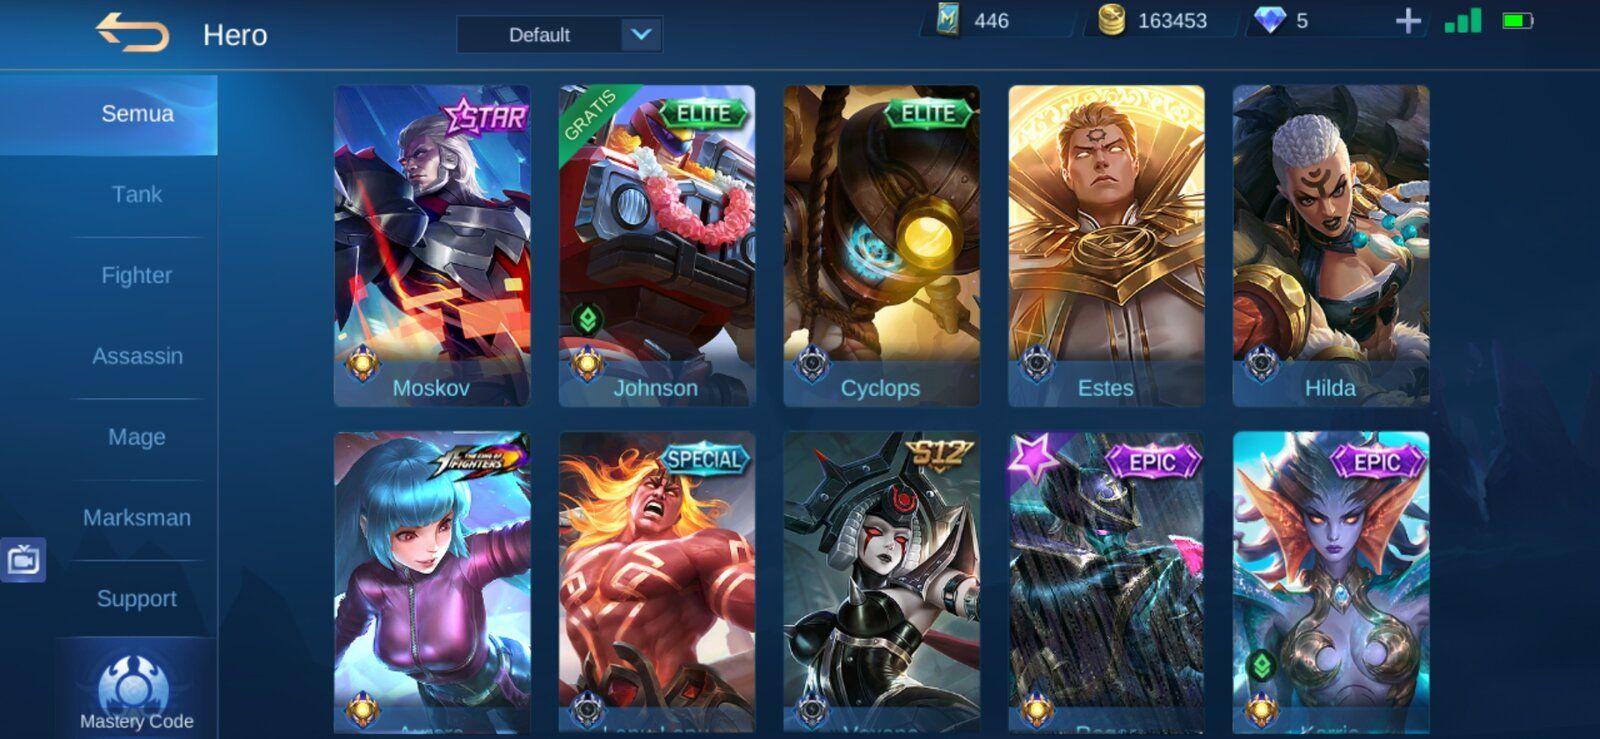 Screenshot_20200127-045457_Mobile Legends Bang Bang.jpg